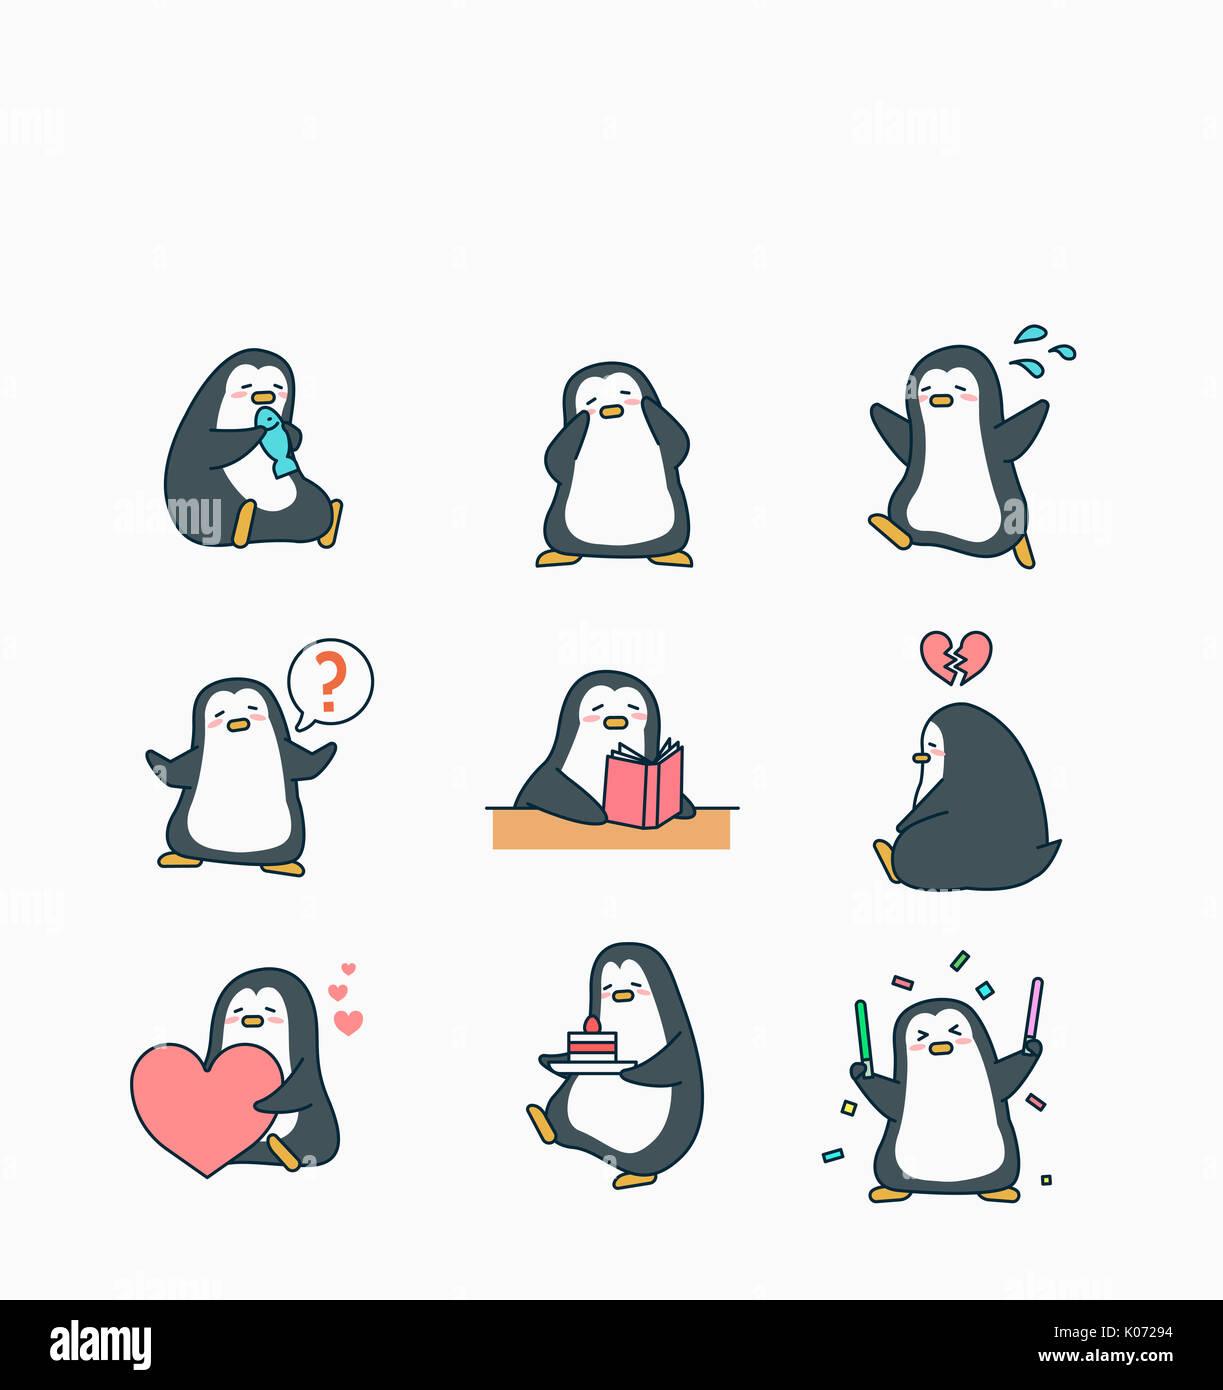 17 Penguin Eating Fish Illustrations, Royalty-Free Vector Graphics & Clip  Art - iStock